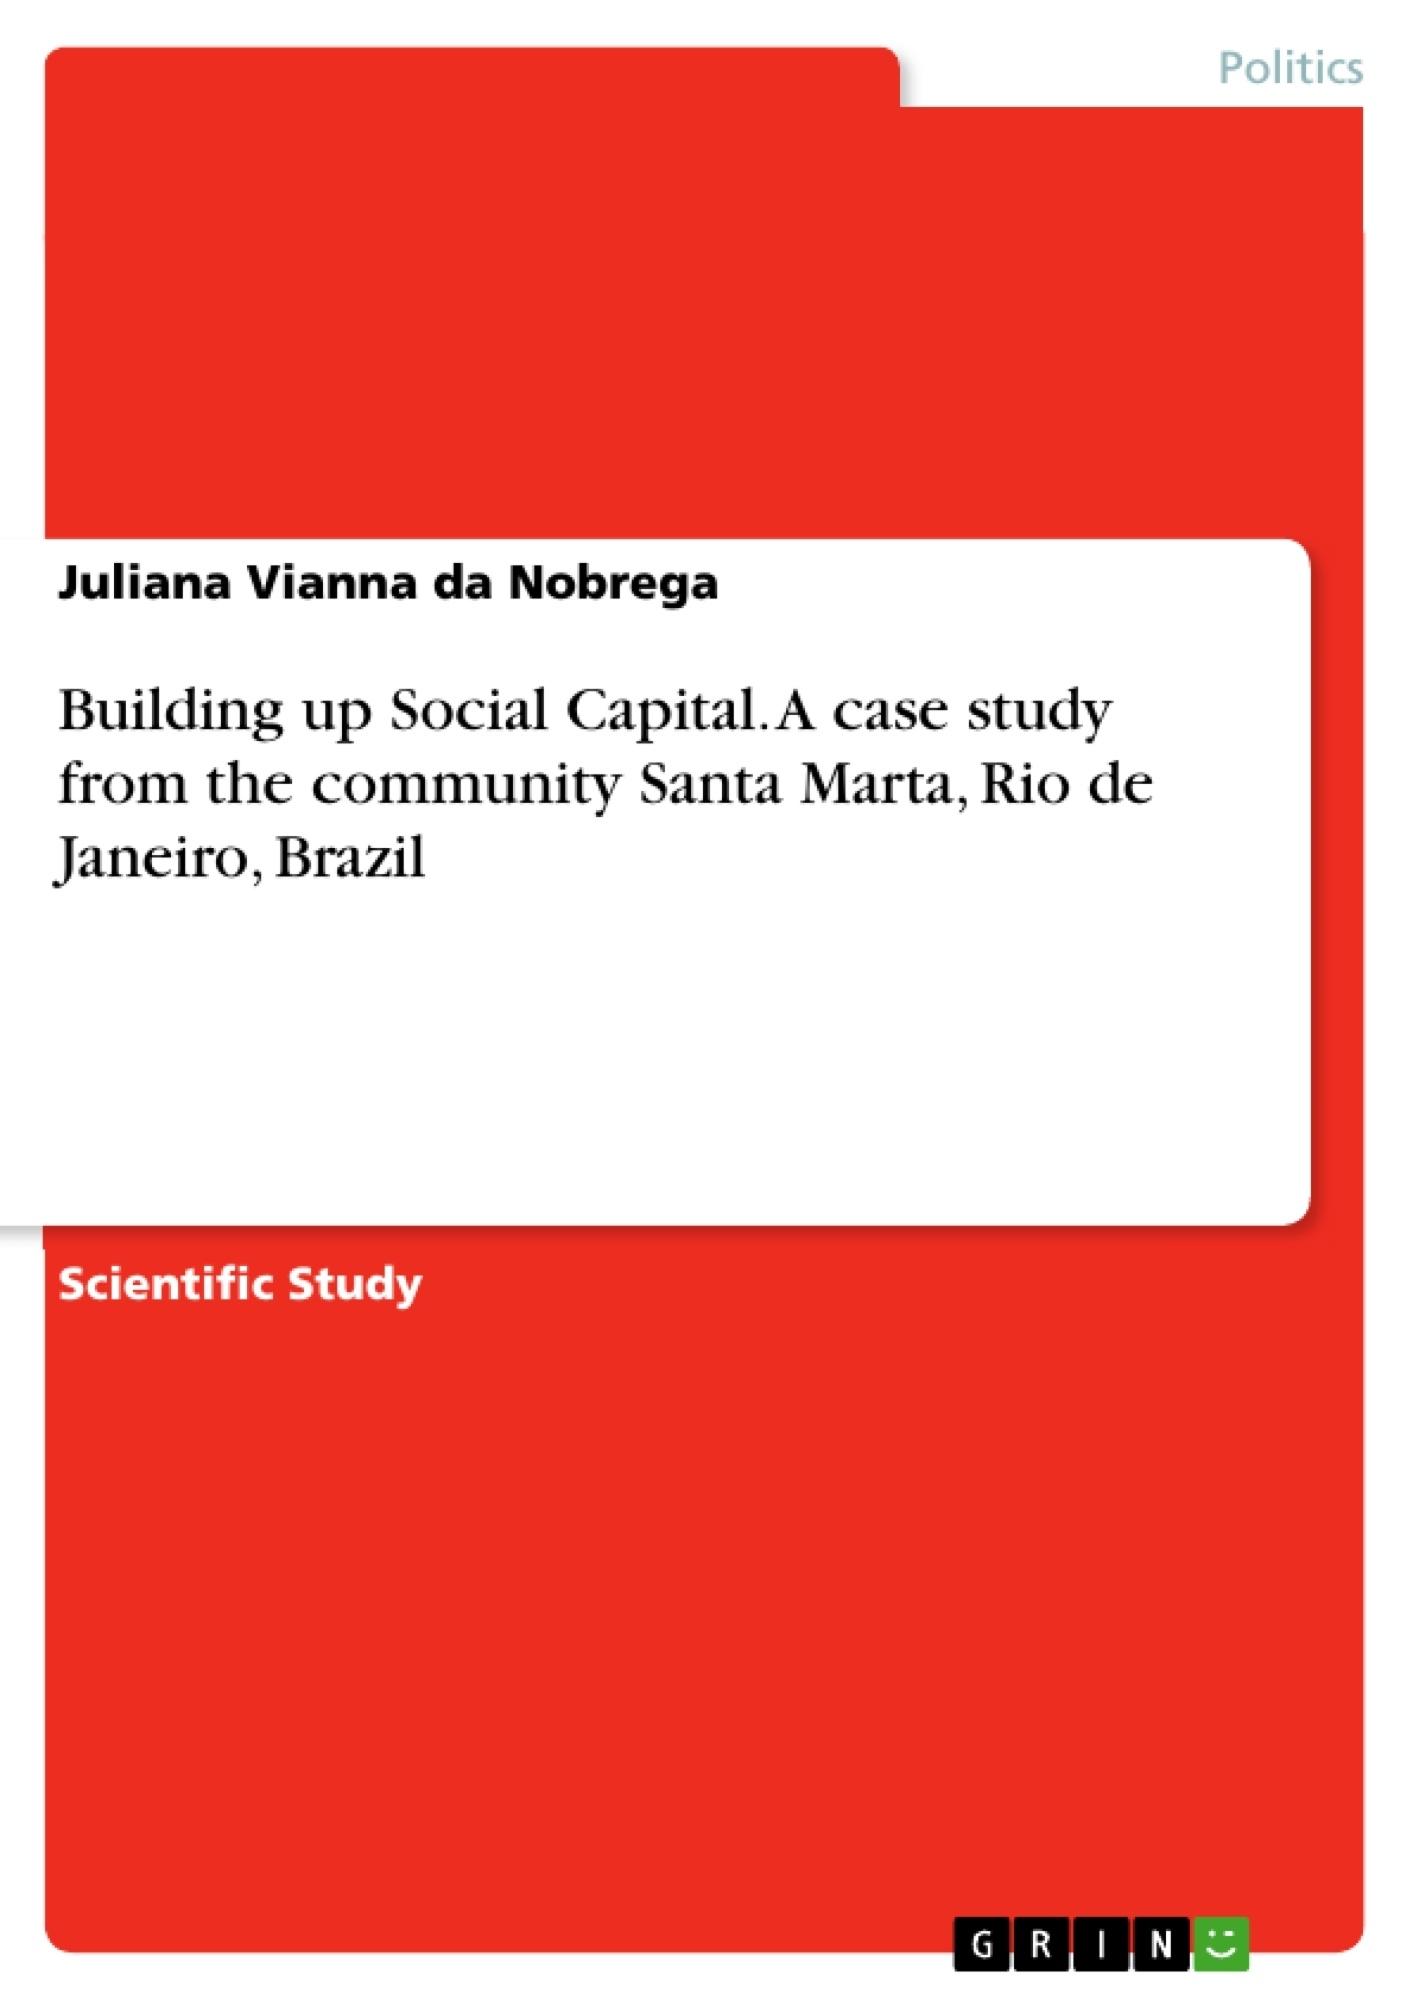 Title: Building up Social Capital. A case study from the community Santa Marta, Rio de Janeiro, Brazil